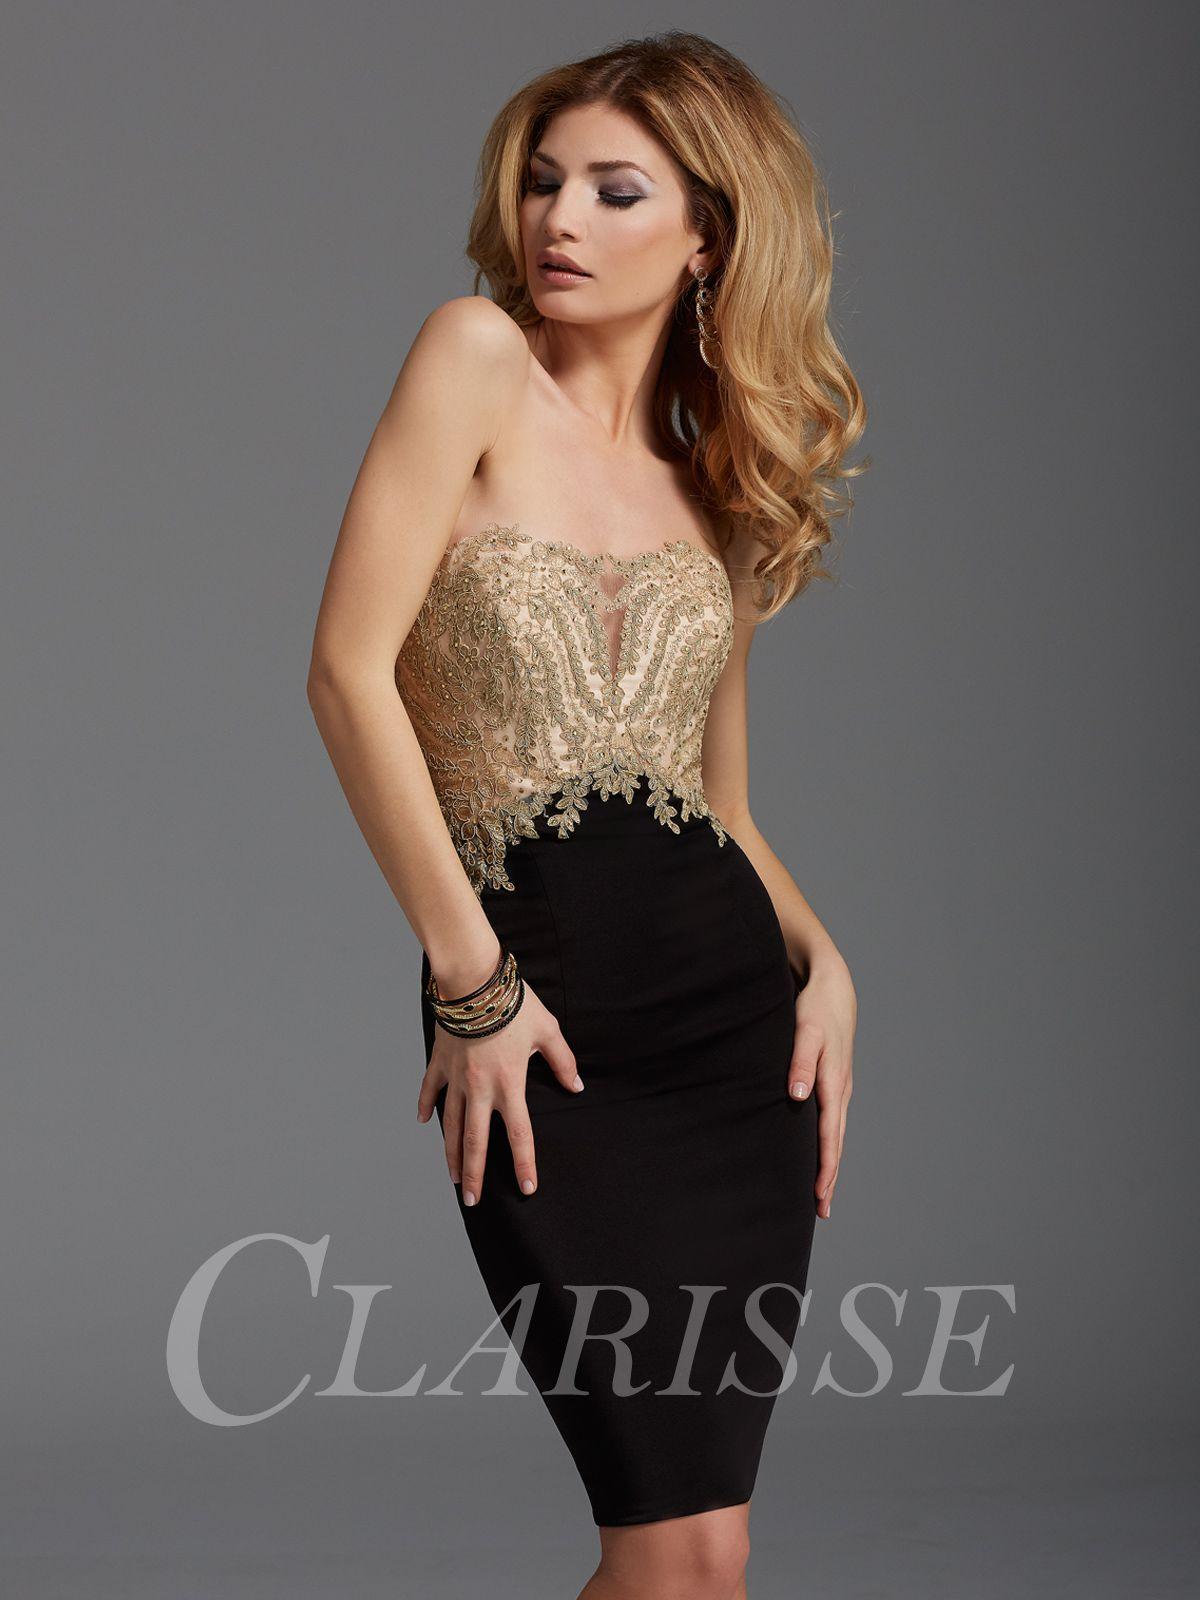 Clarisse Black and Gold Cocktail Dress 2904 | Pinterest